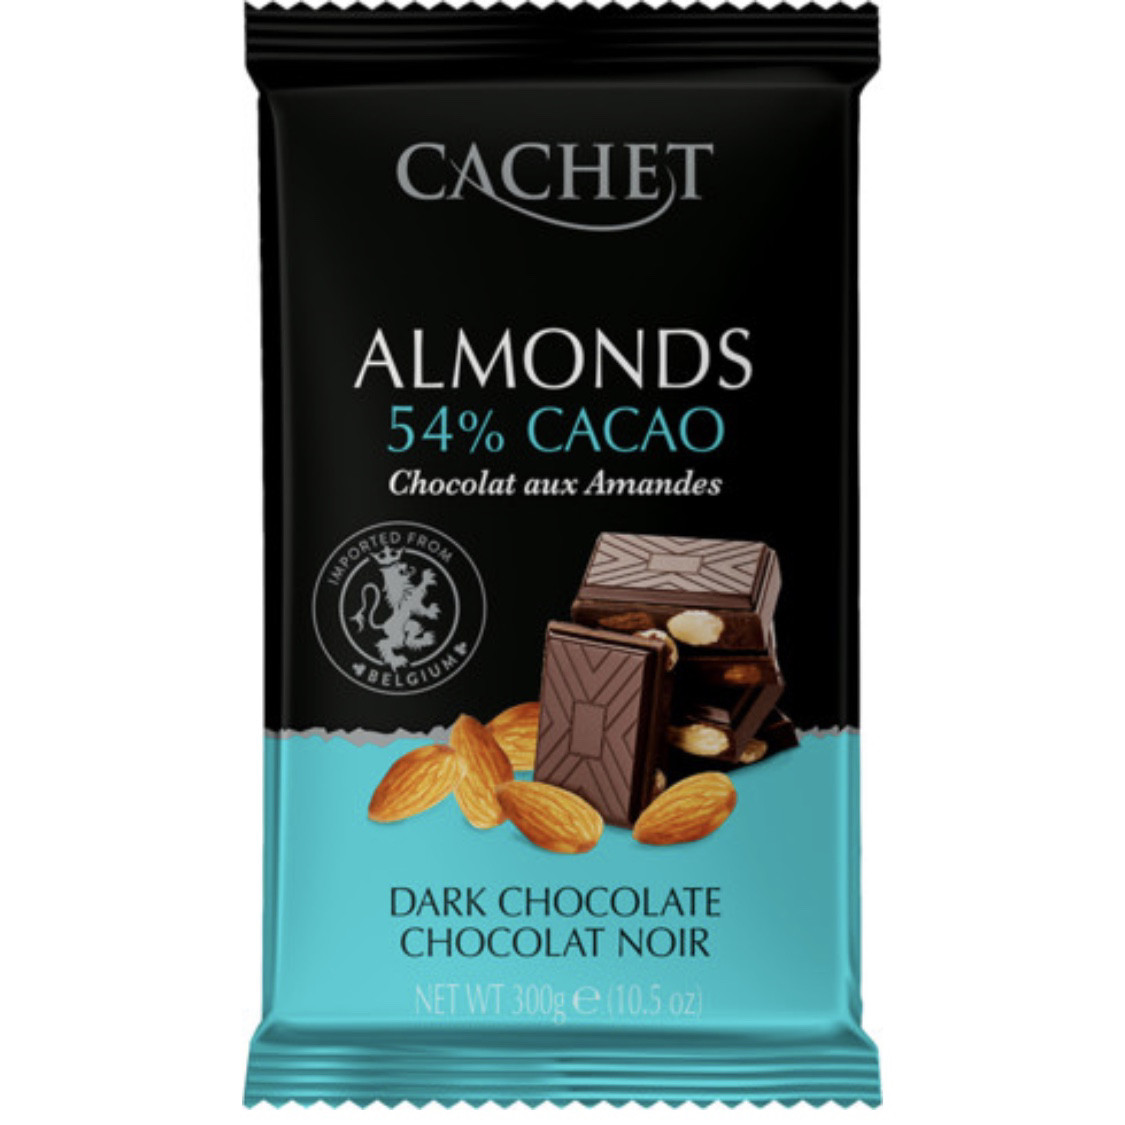 Cachet Чёрный шоколад 54% какао + цельный миндаль